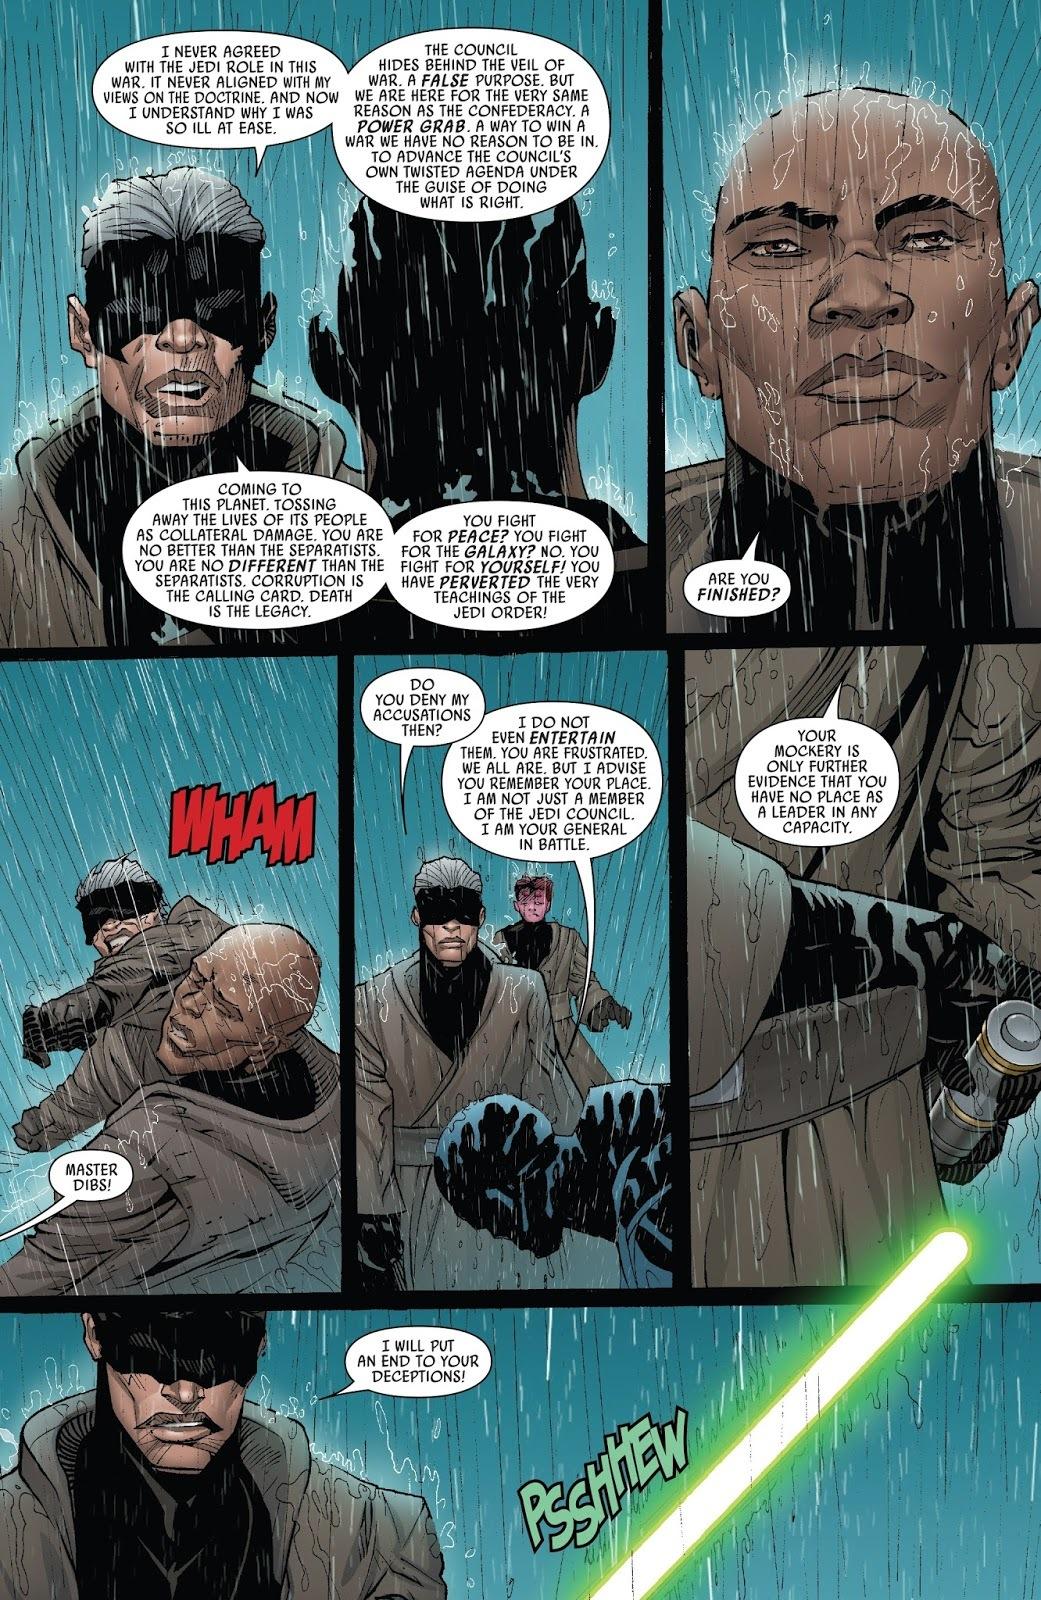 Star Wars: Mace Windu Issue #03